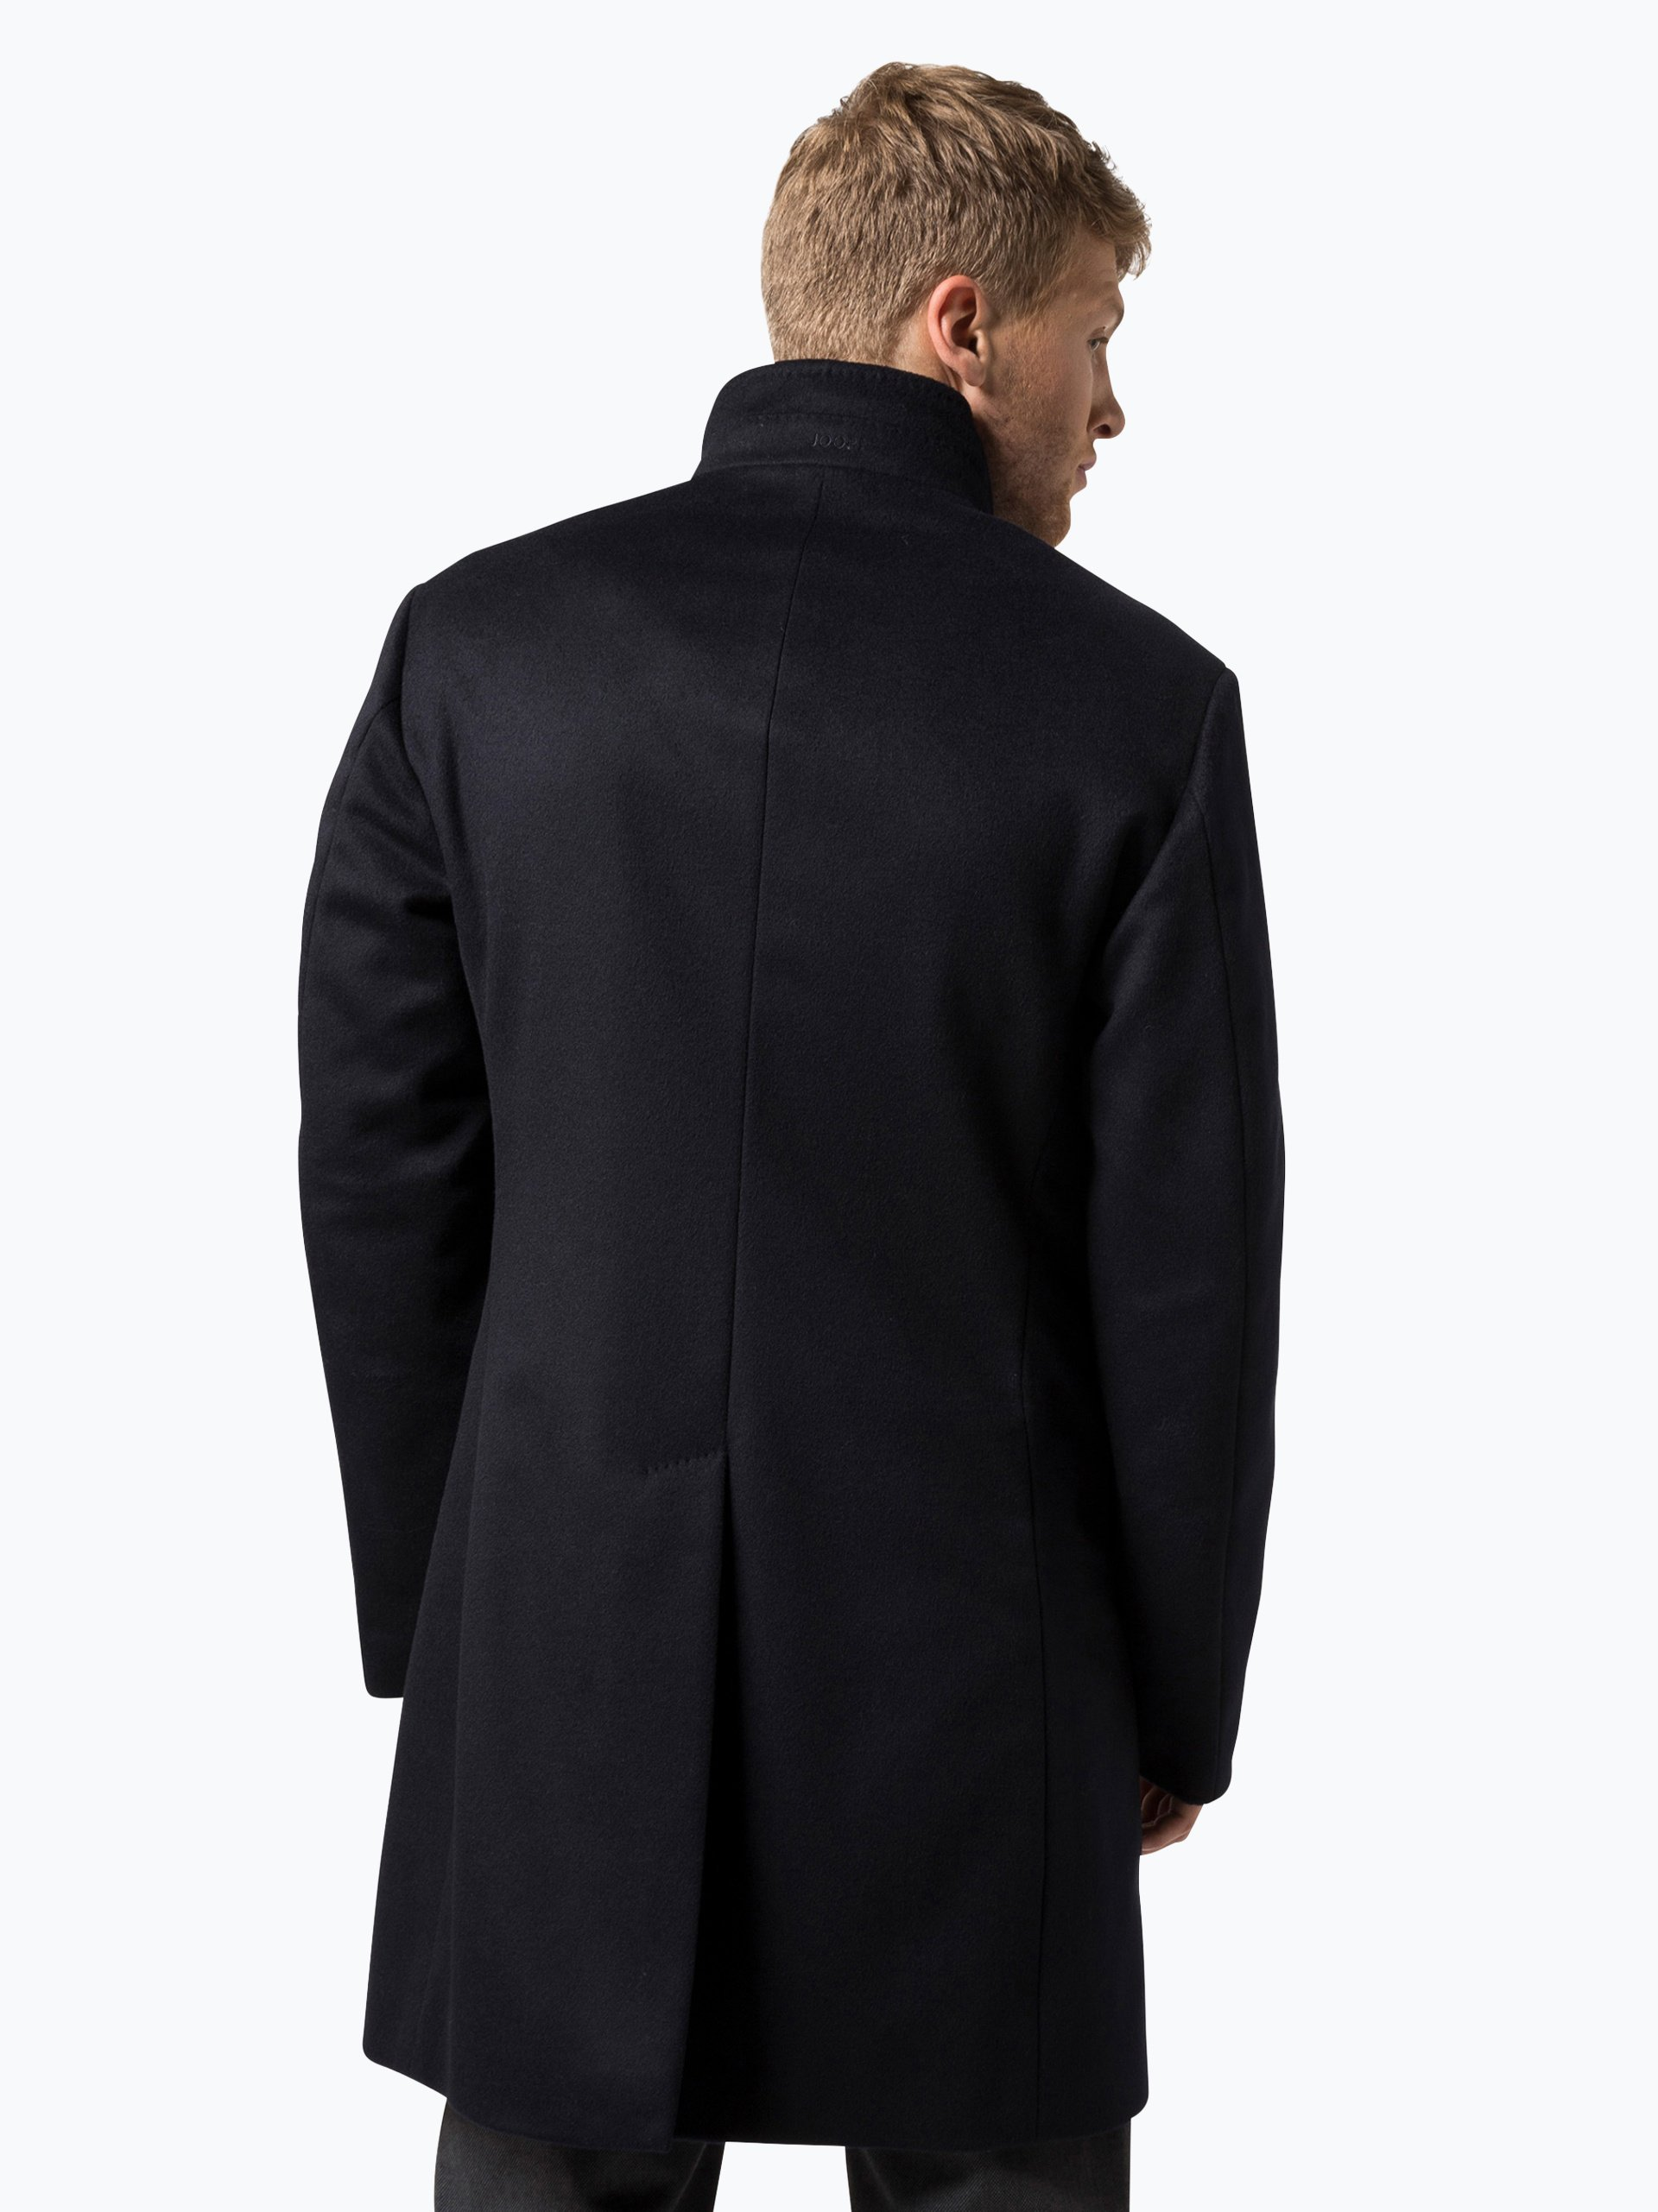 joop herren mantel mit cashmere anteil marine uni online. Black Bedroom Furniture Sets. Home Design Ideas